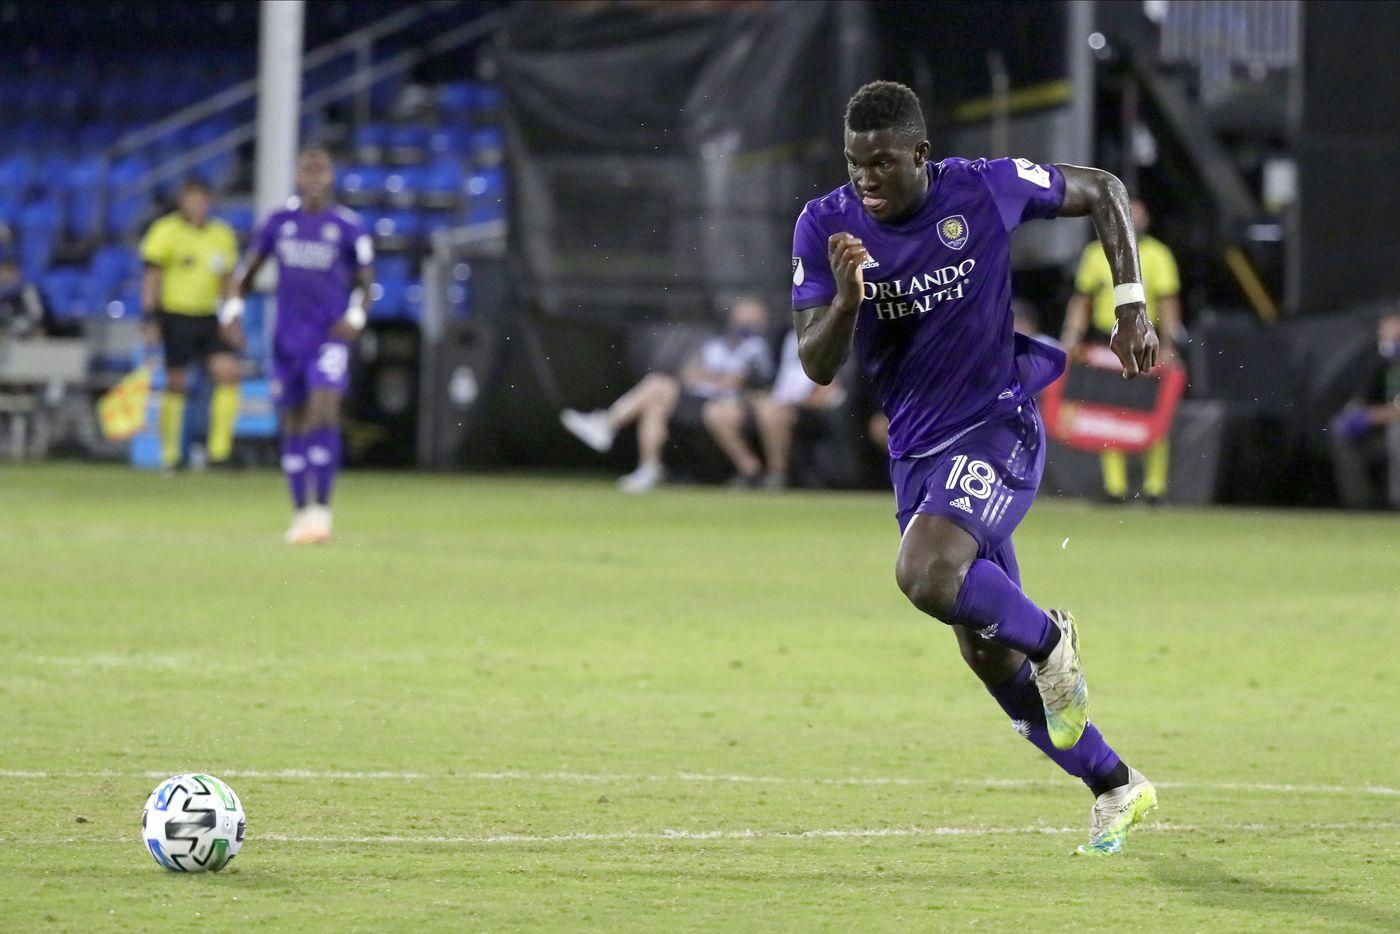 Orlando City SC forward Daryl Dike. Photo: Orlando Sentinel.